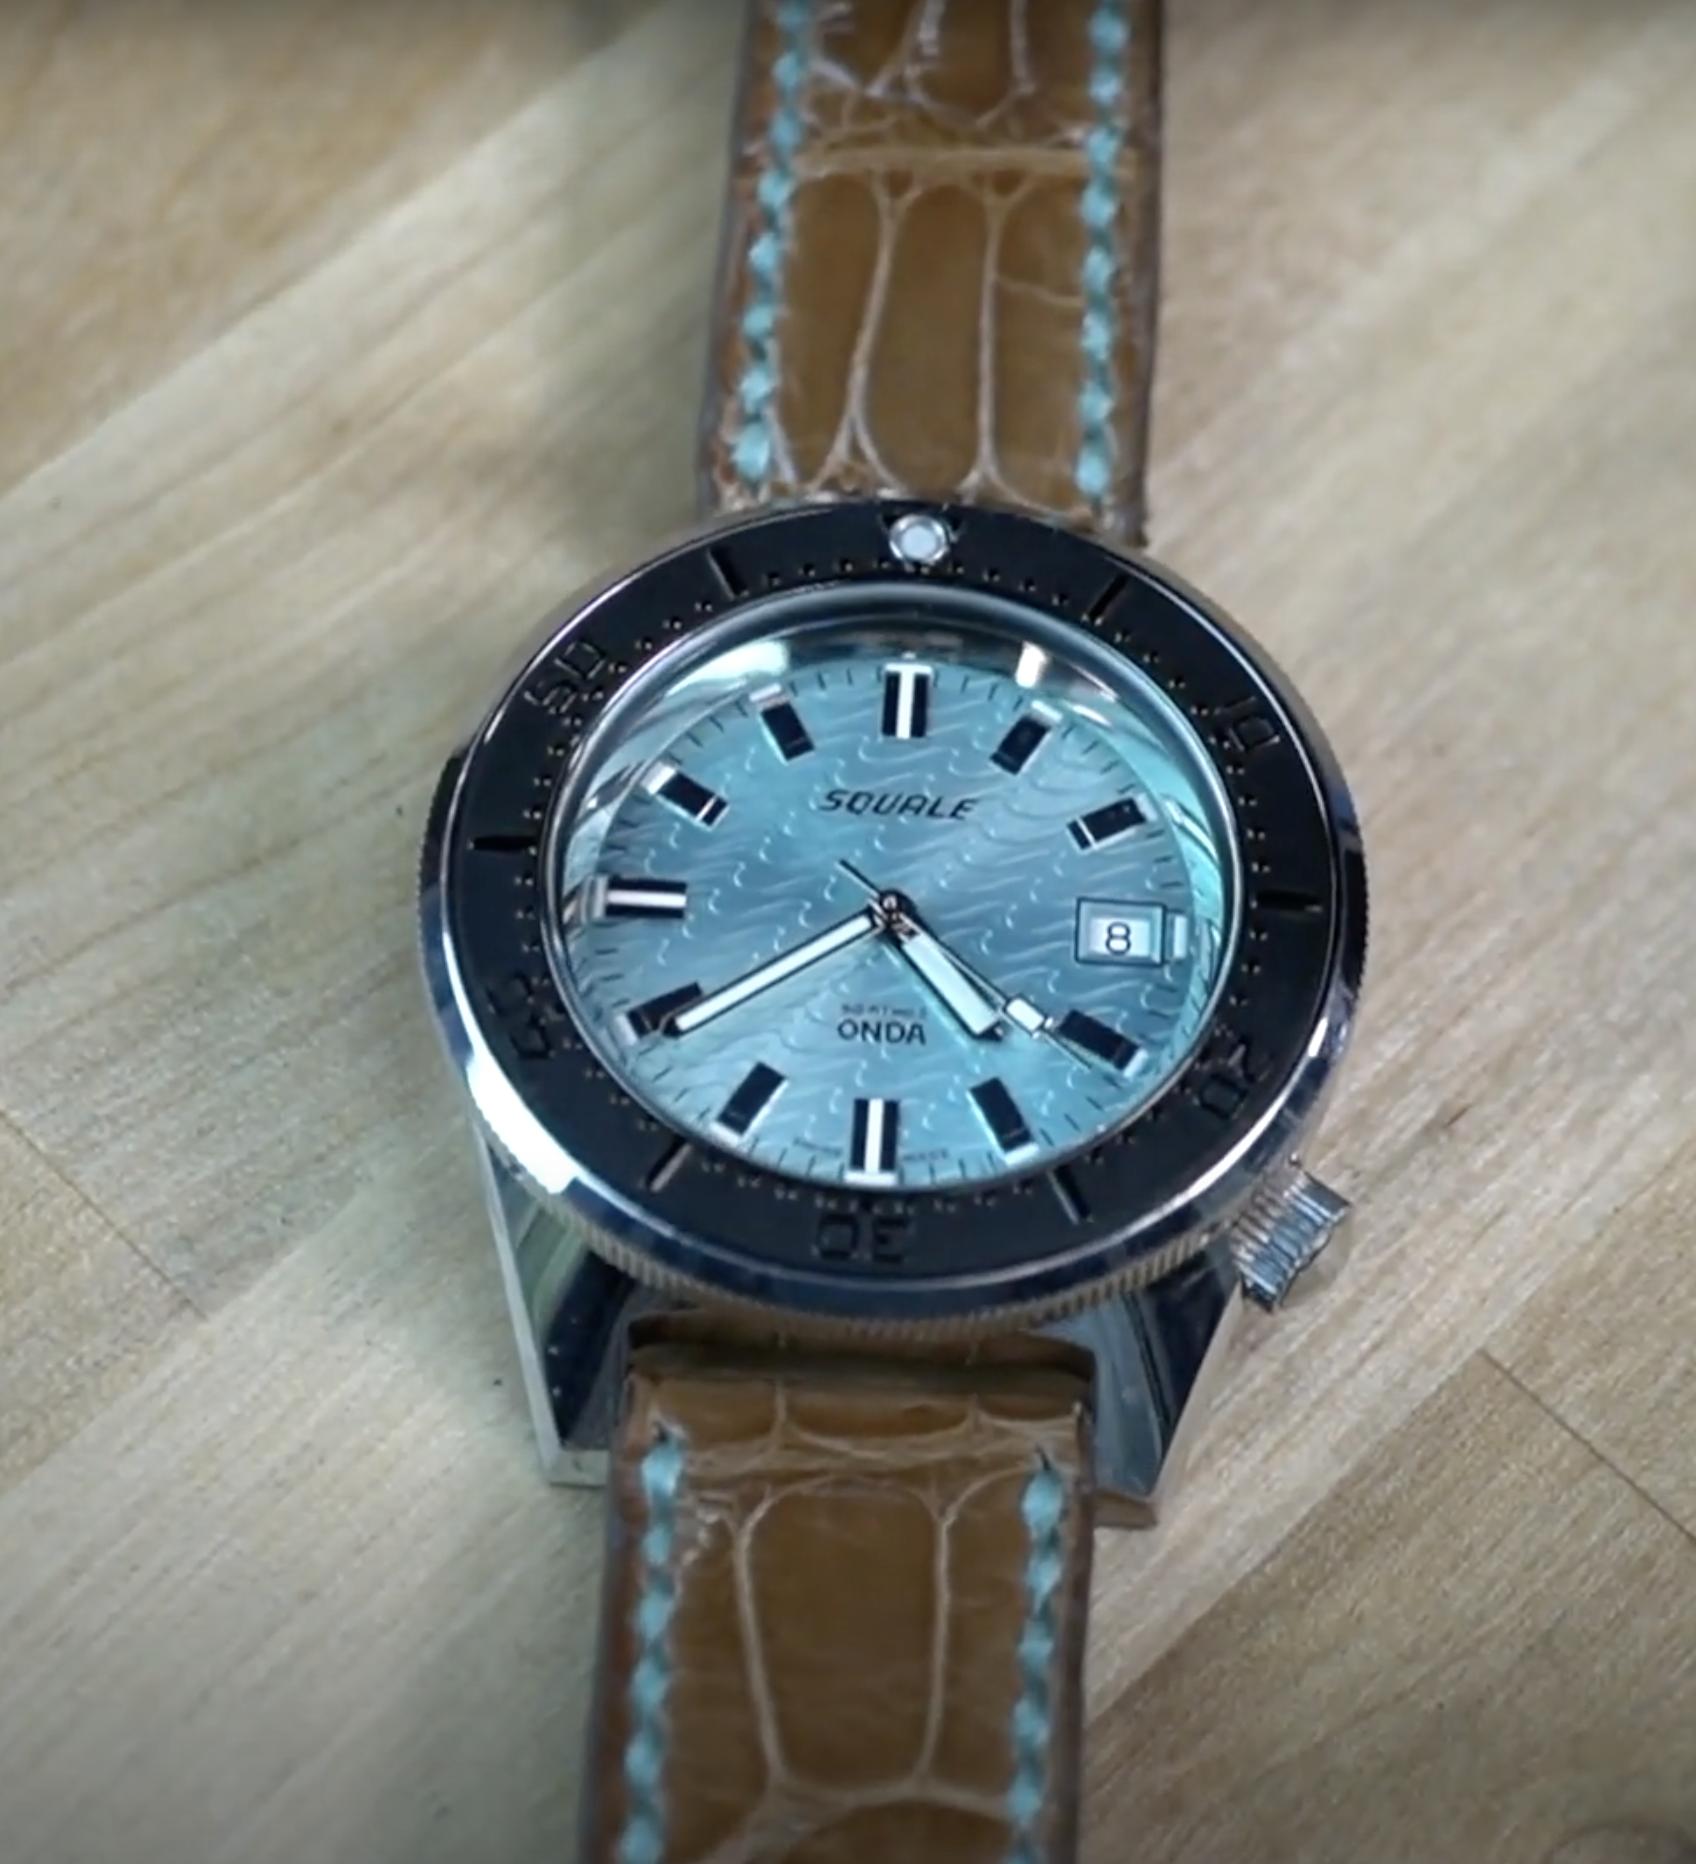 Peanut Tan Alligator Watch Strap with Aqua Blue Stitching